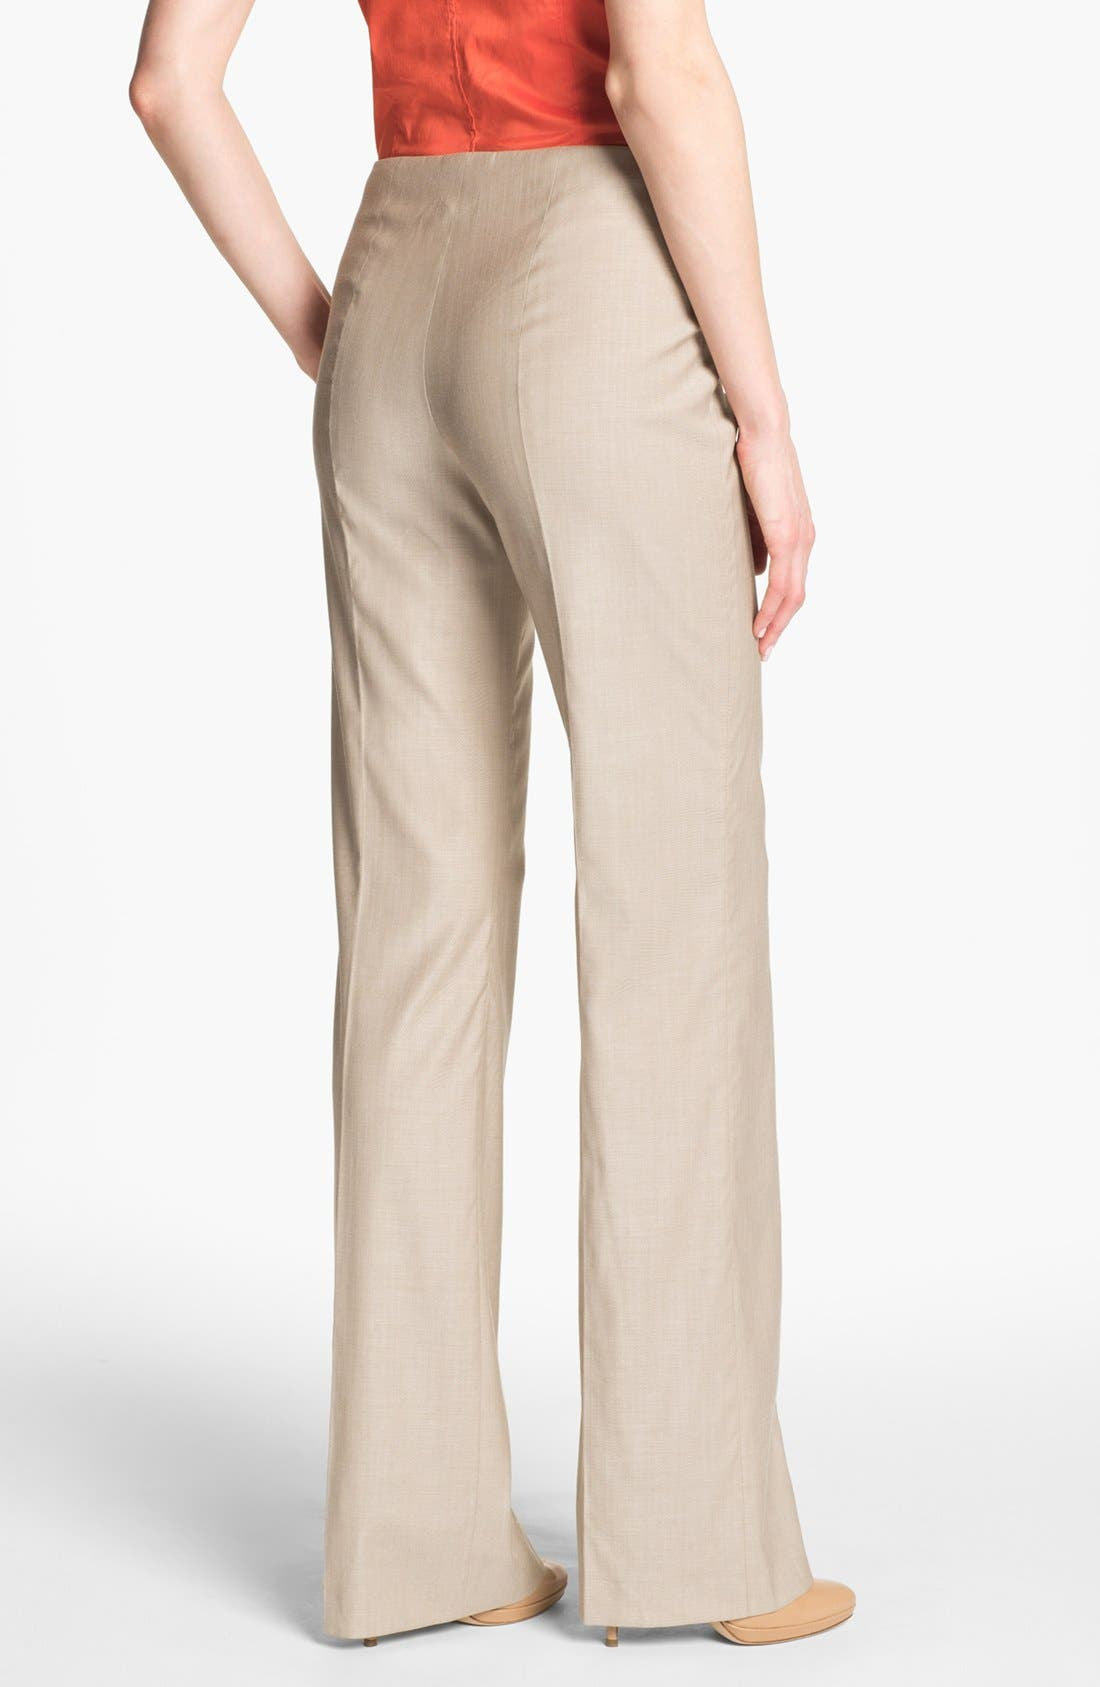 HUGO BOSS 'Tilana' Trousers,                             Alternate thumbnail 6, color,                             294